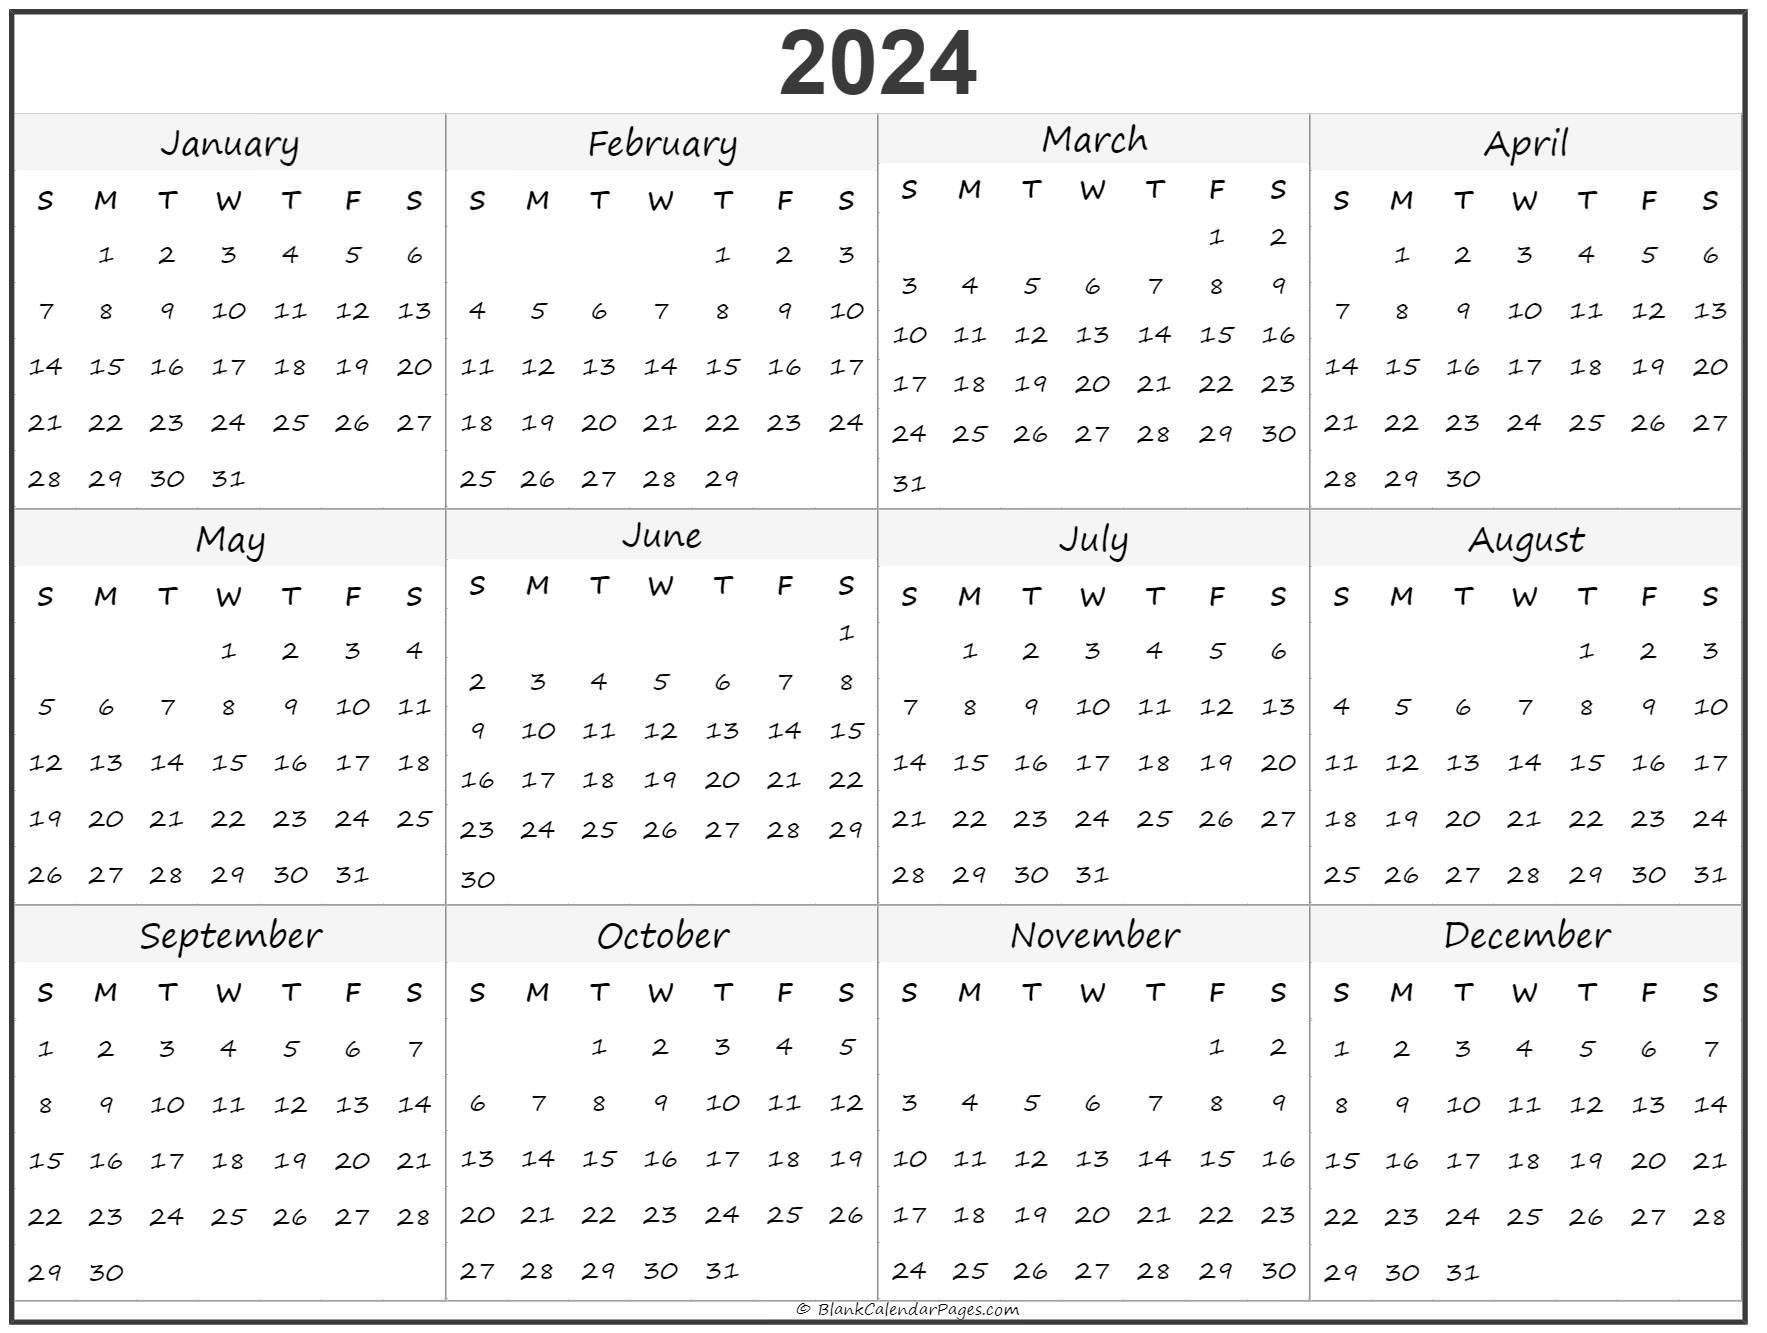 Yearly calendar 2024